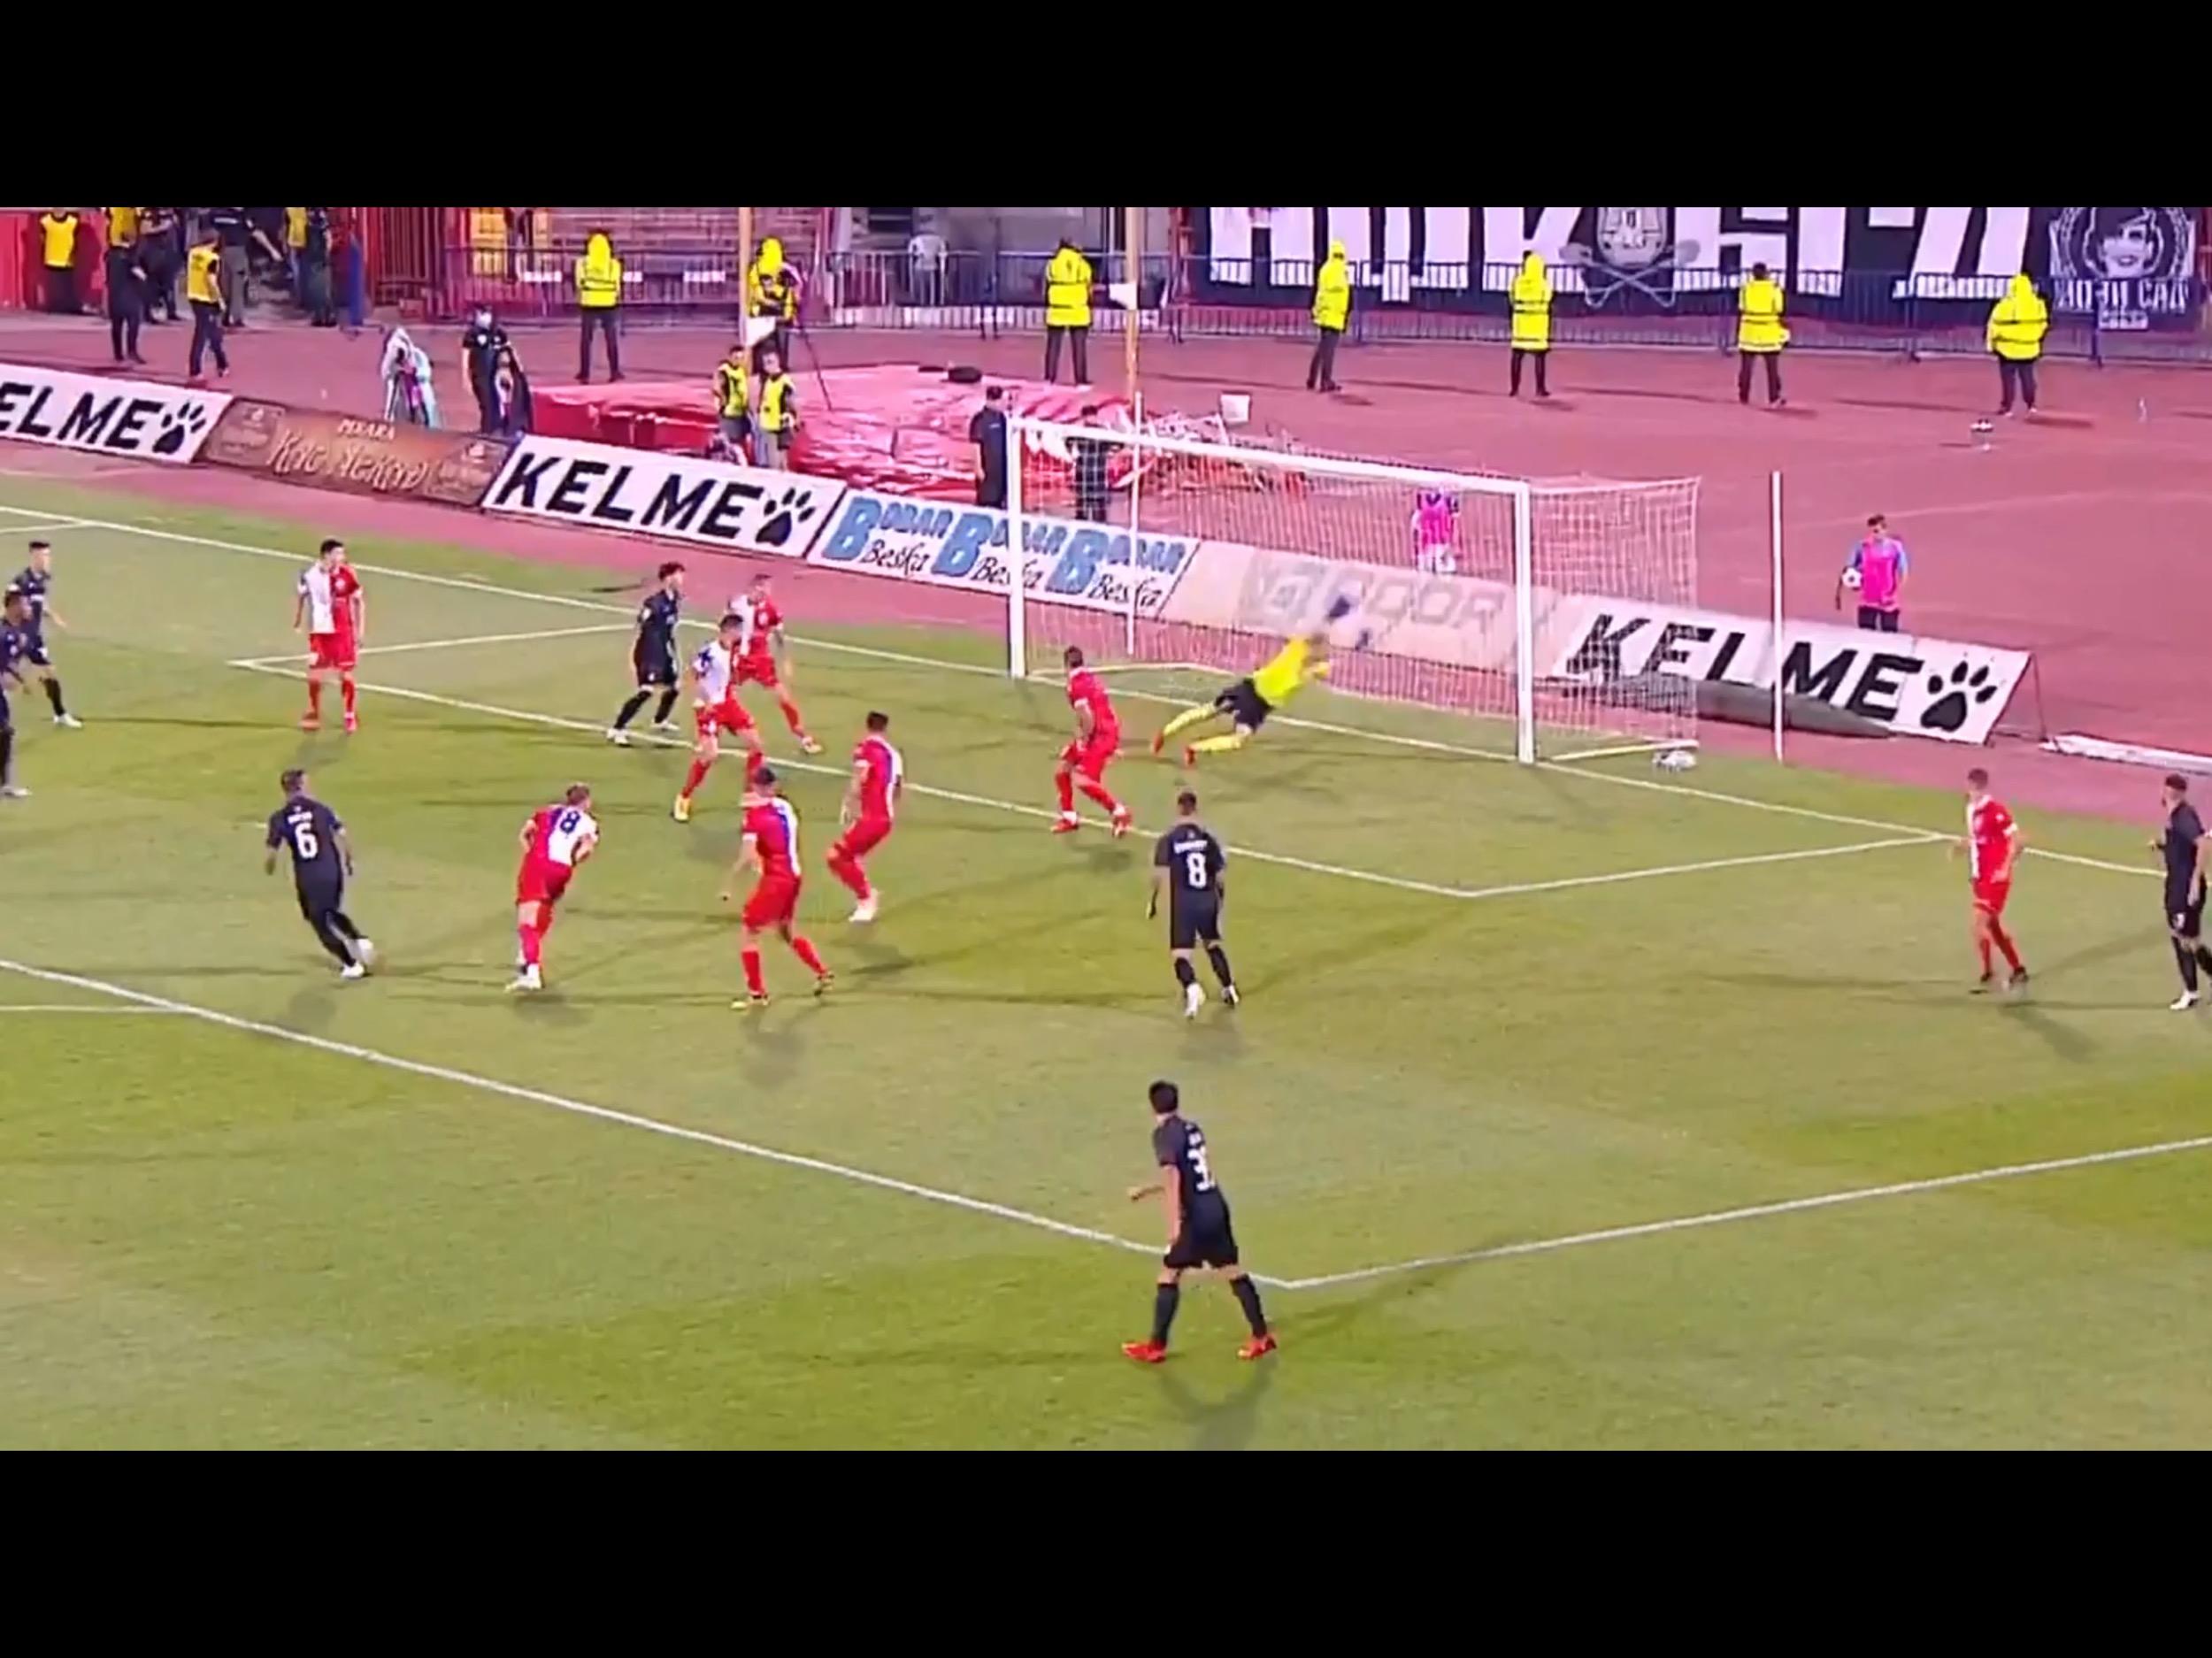 Izveštaj: Vojvodina-Partizan 0:2. Dva brutalna gola Natka za rutinsku pobedu Partizana (VIDEO)